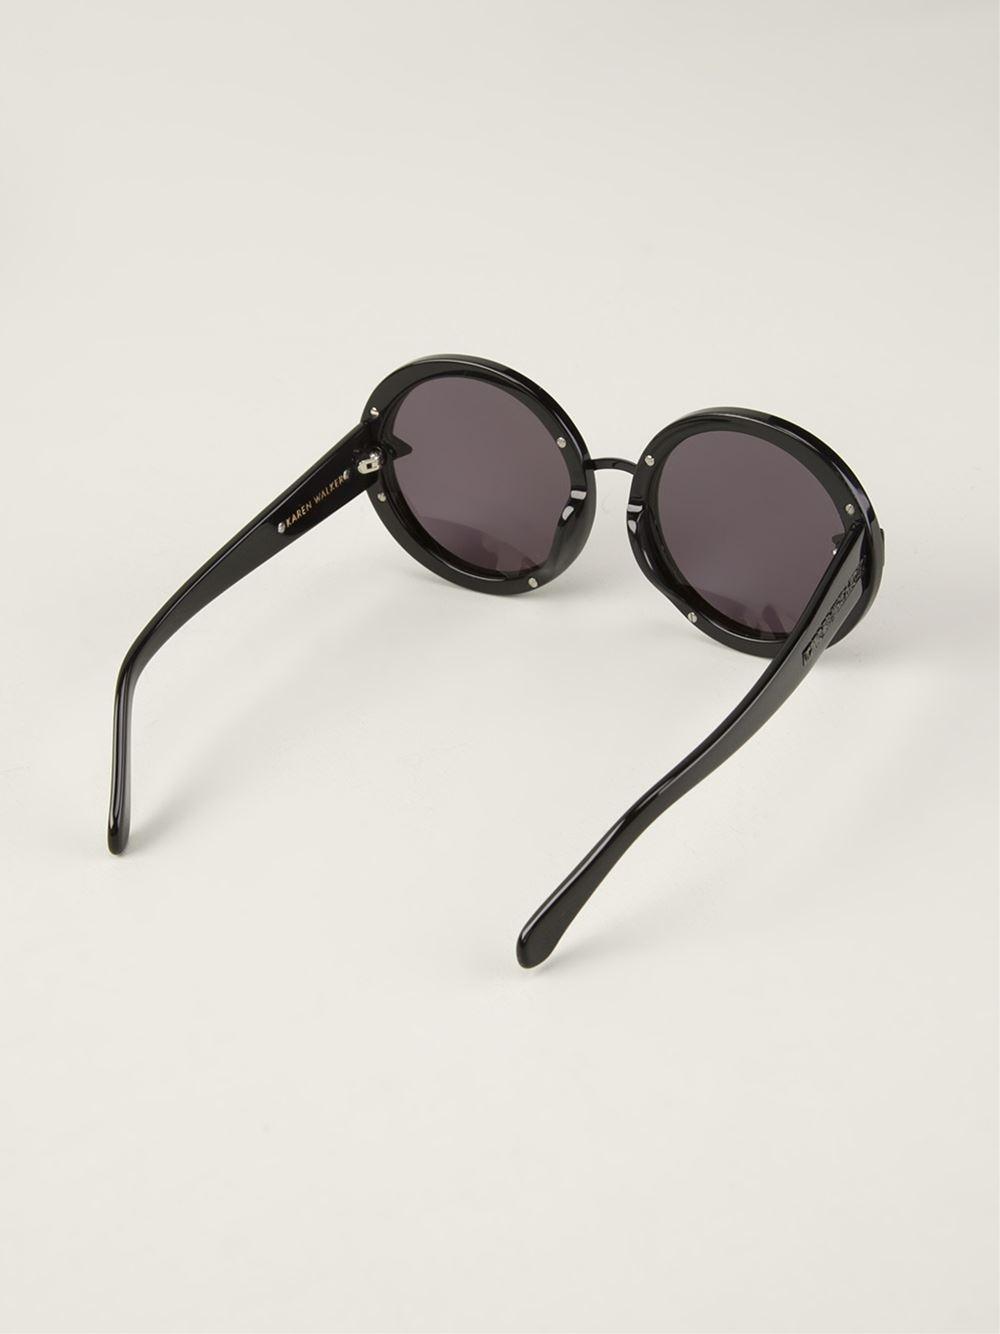 693556d85361 Lyst - Karen Walker Orbit Filigree Sunglasses in Black